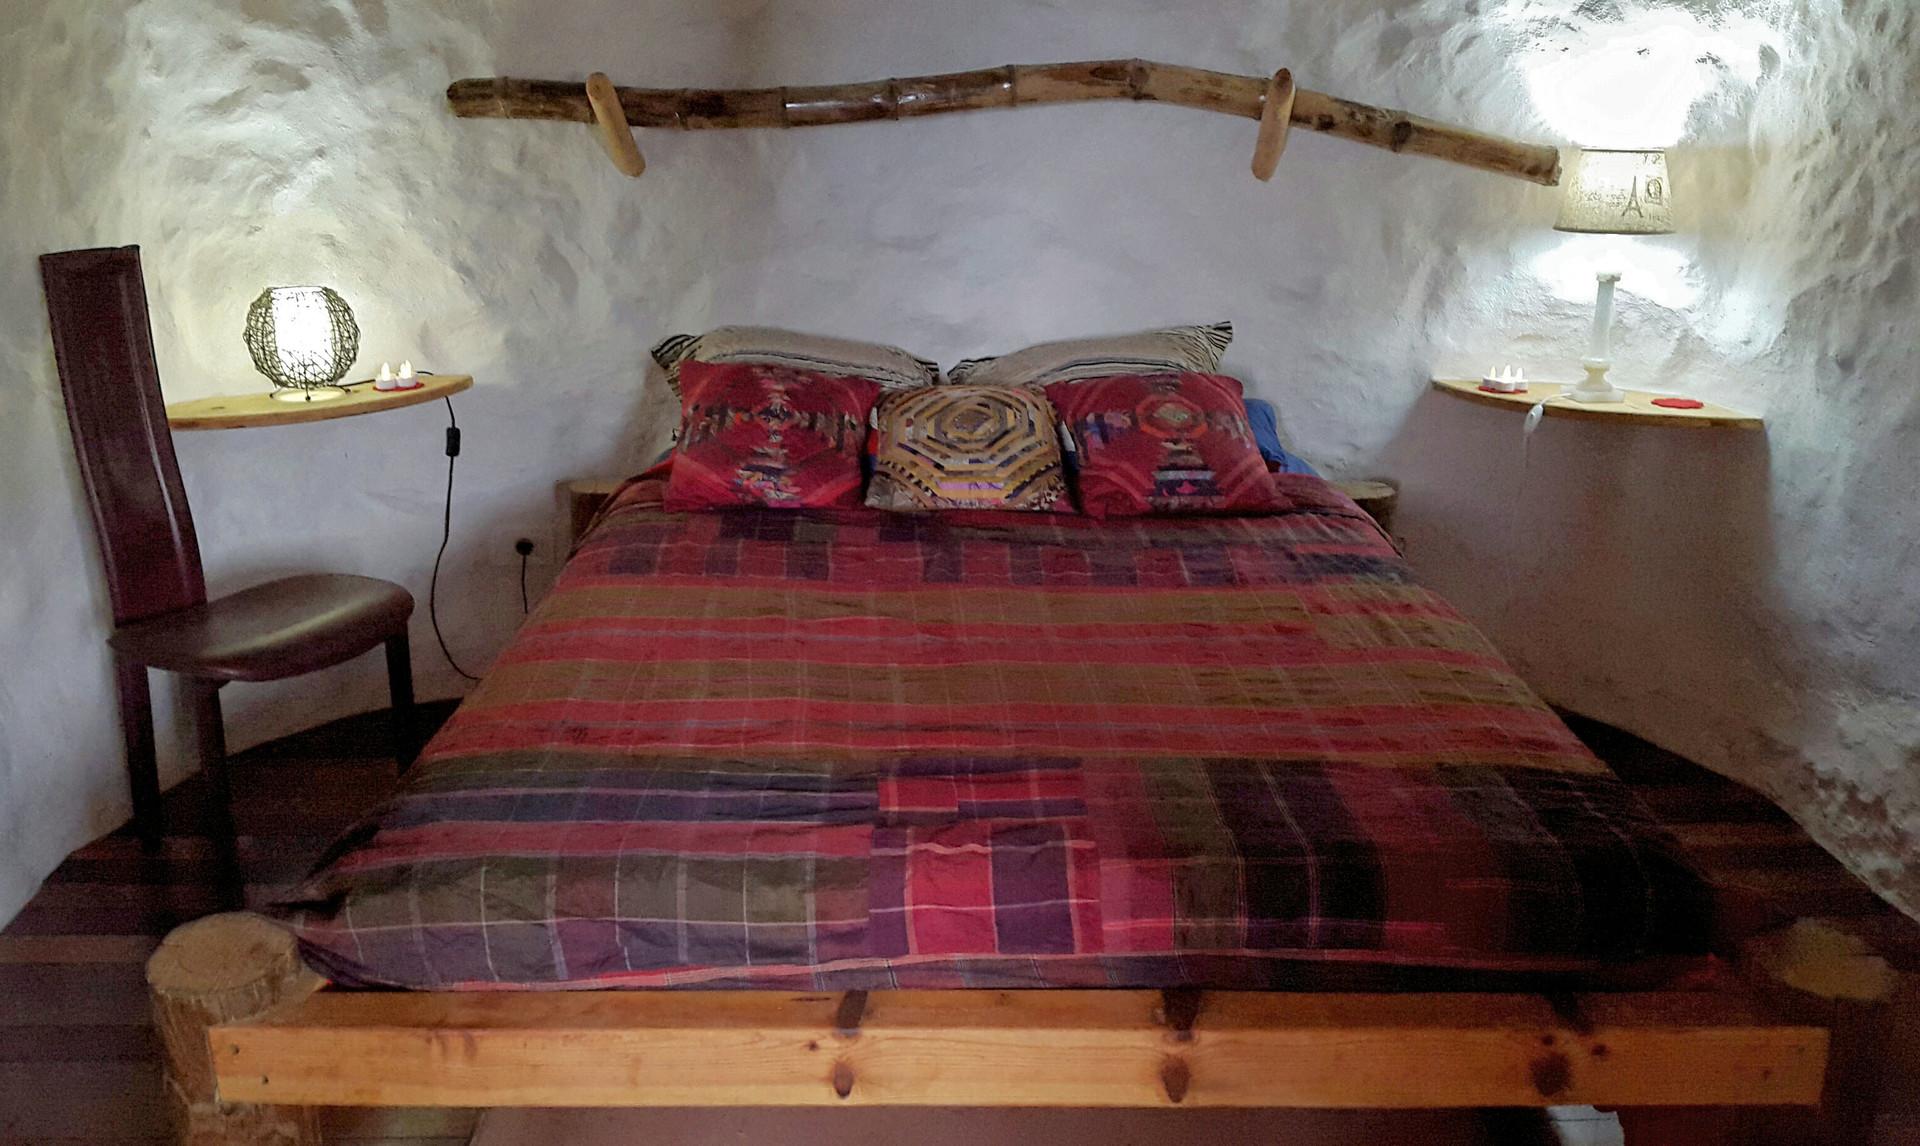 2-bedroomed-cave-house-la-atalaya-santa-brigida-20-minutes-las-palmas-10-minutes-tafira-university-campus-66026ca7dbc647a32c1ff38aadacf7f7